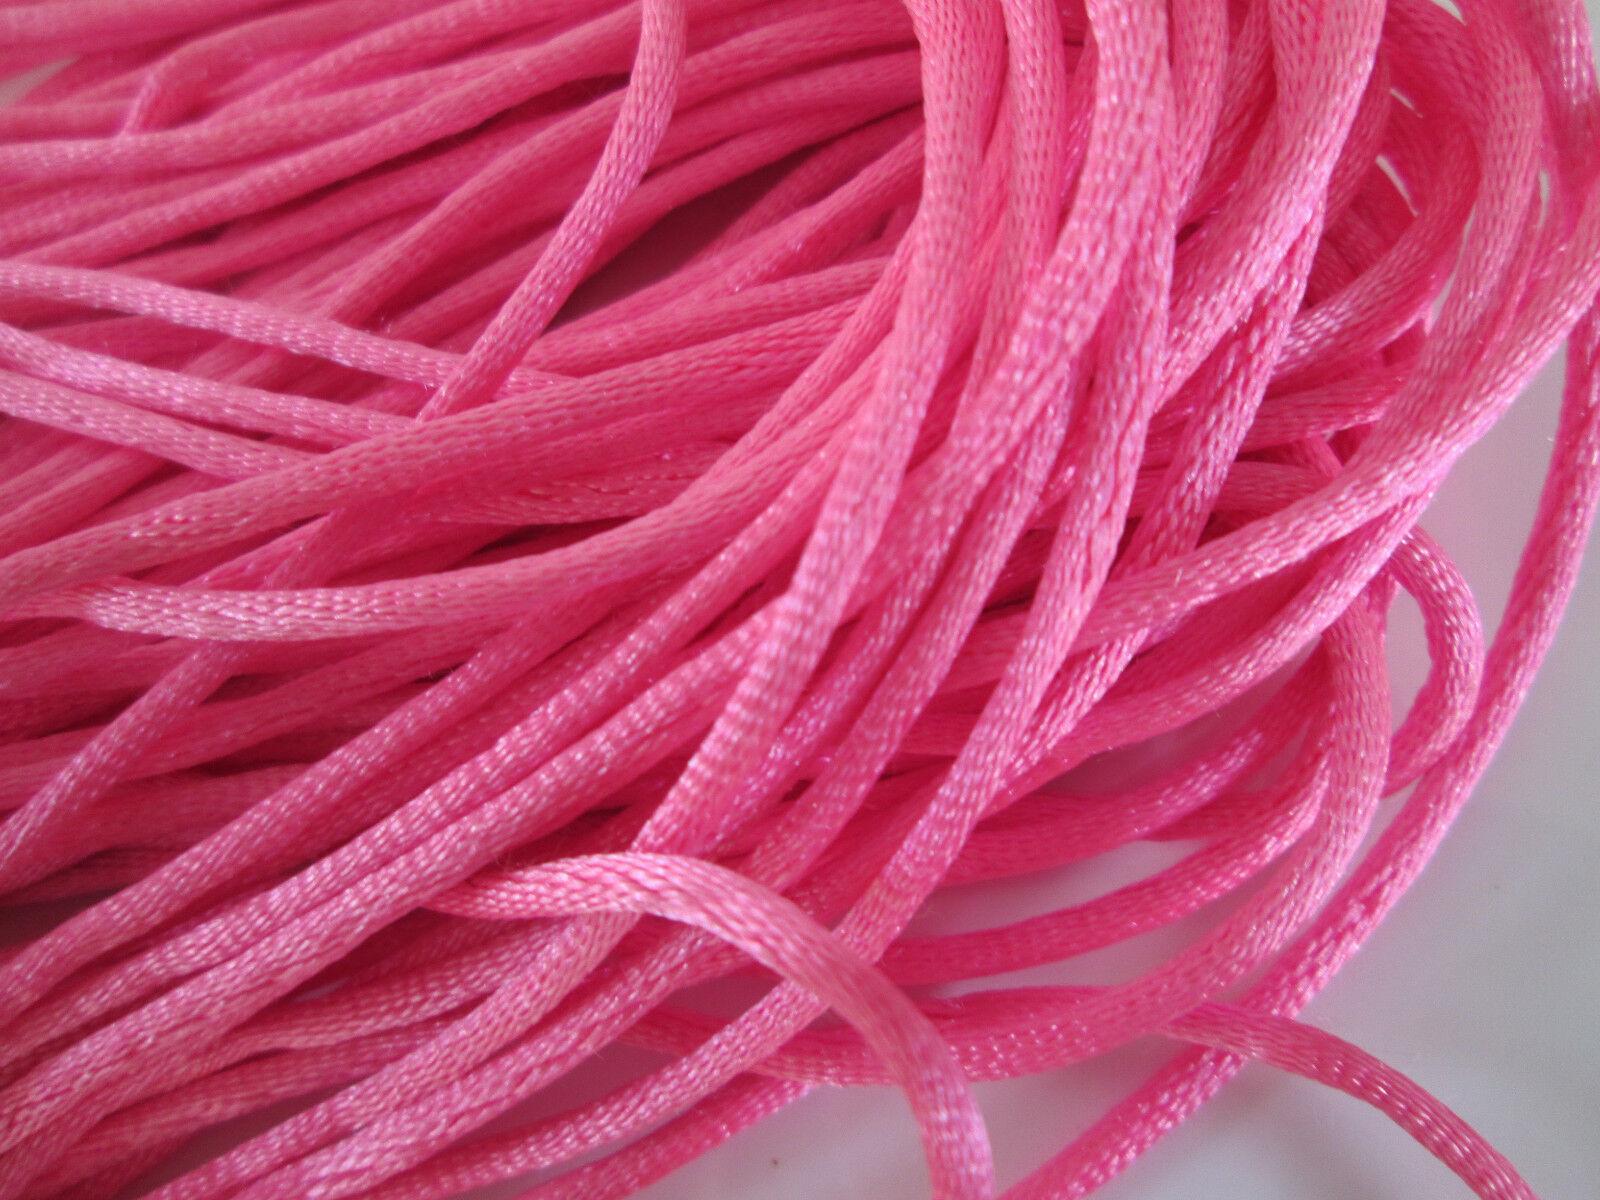 17 METER Satin kordel Pink 2,5mm elegante Borte Spitze KR 080****